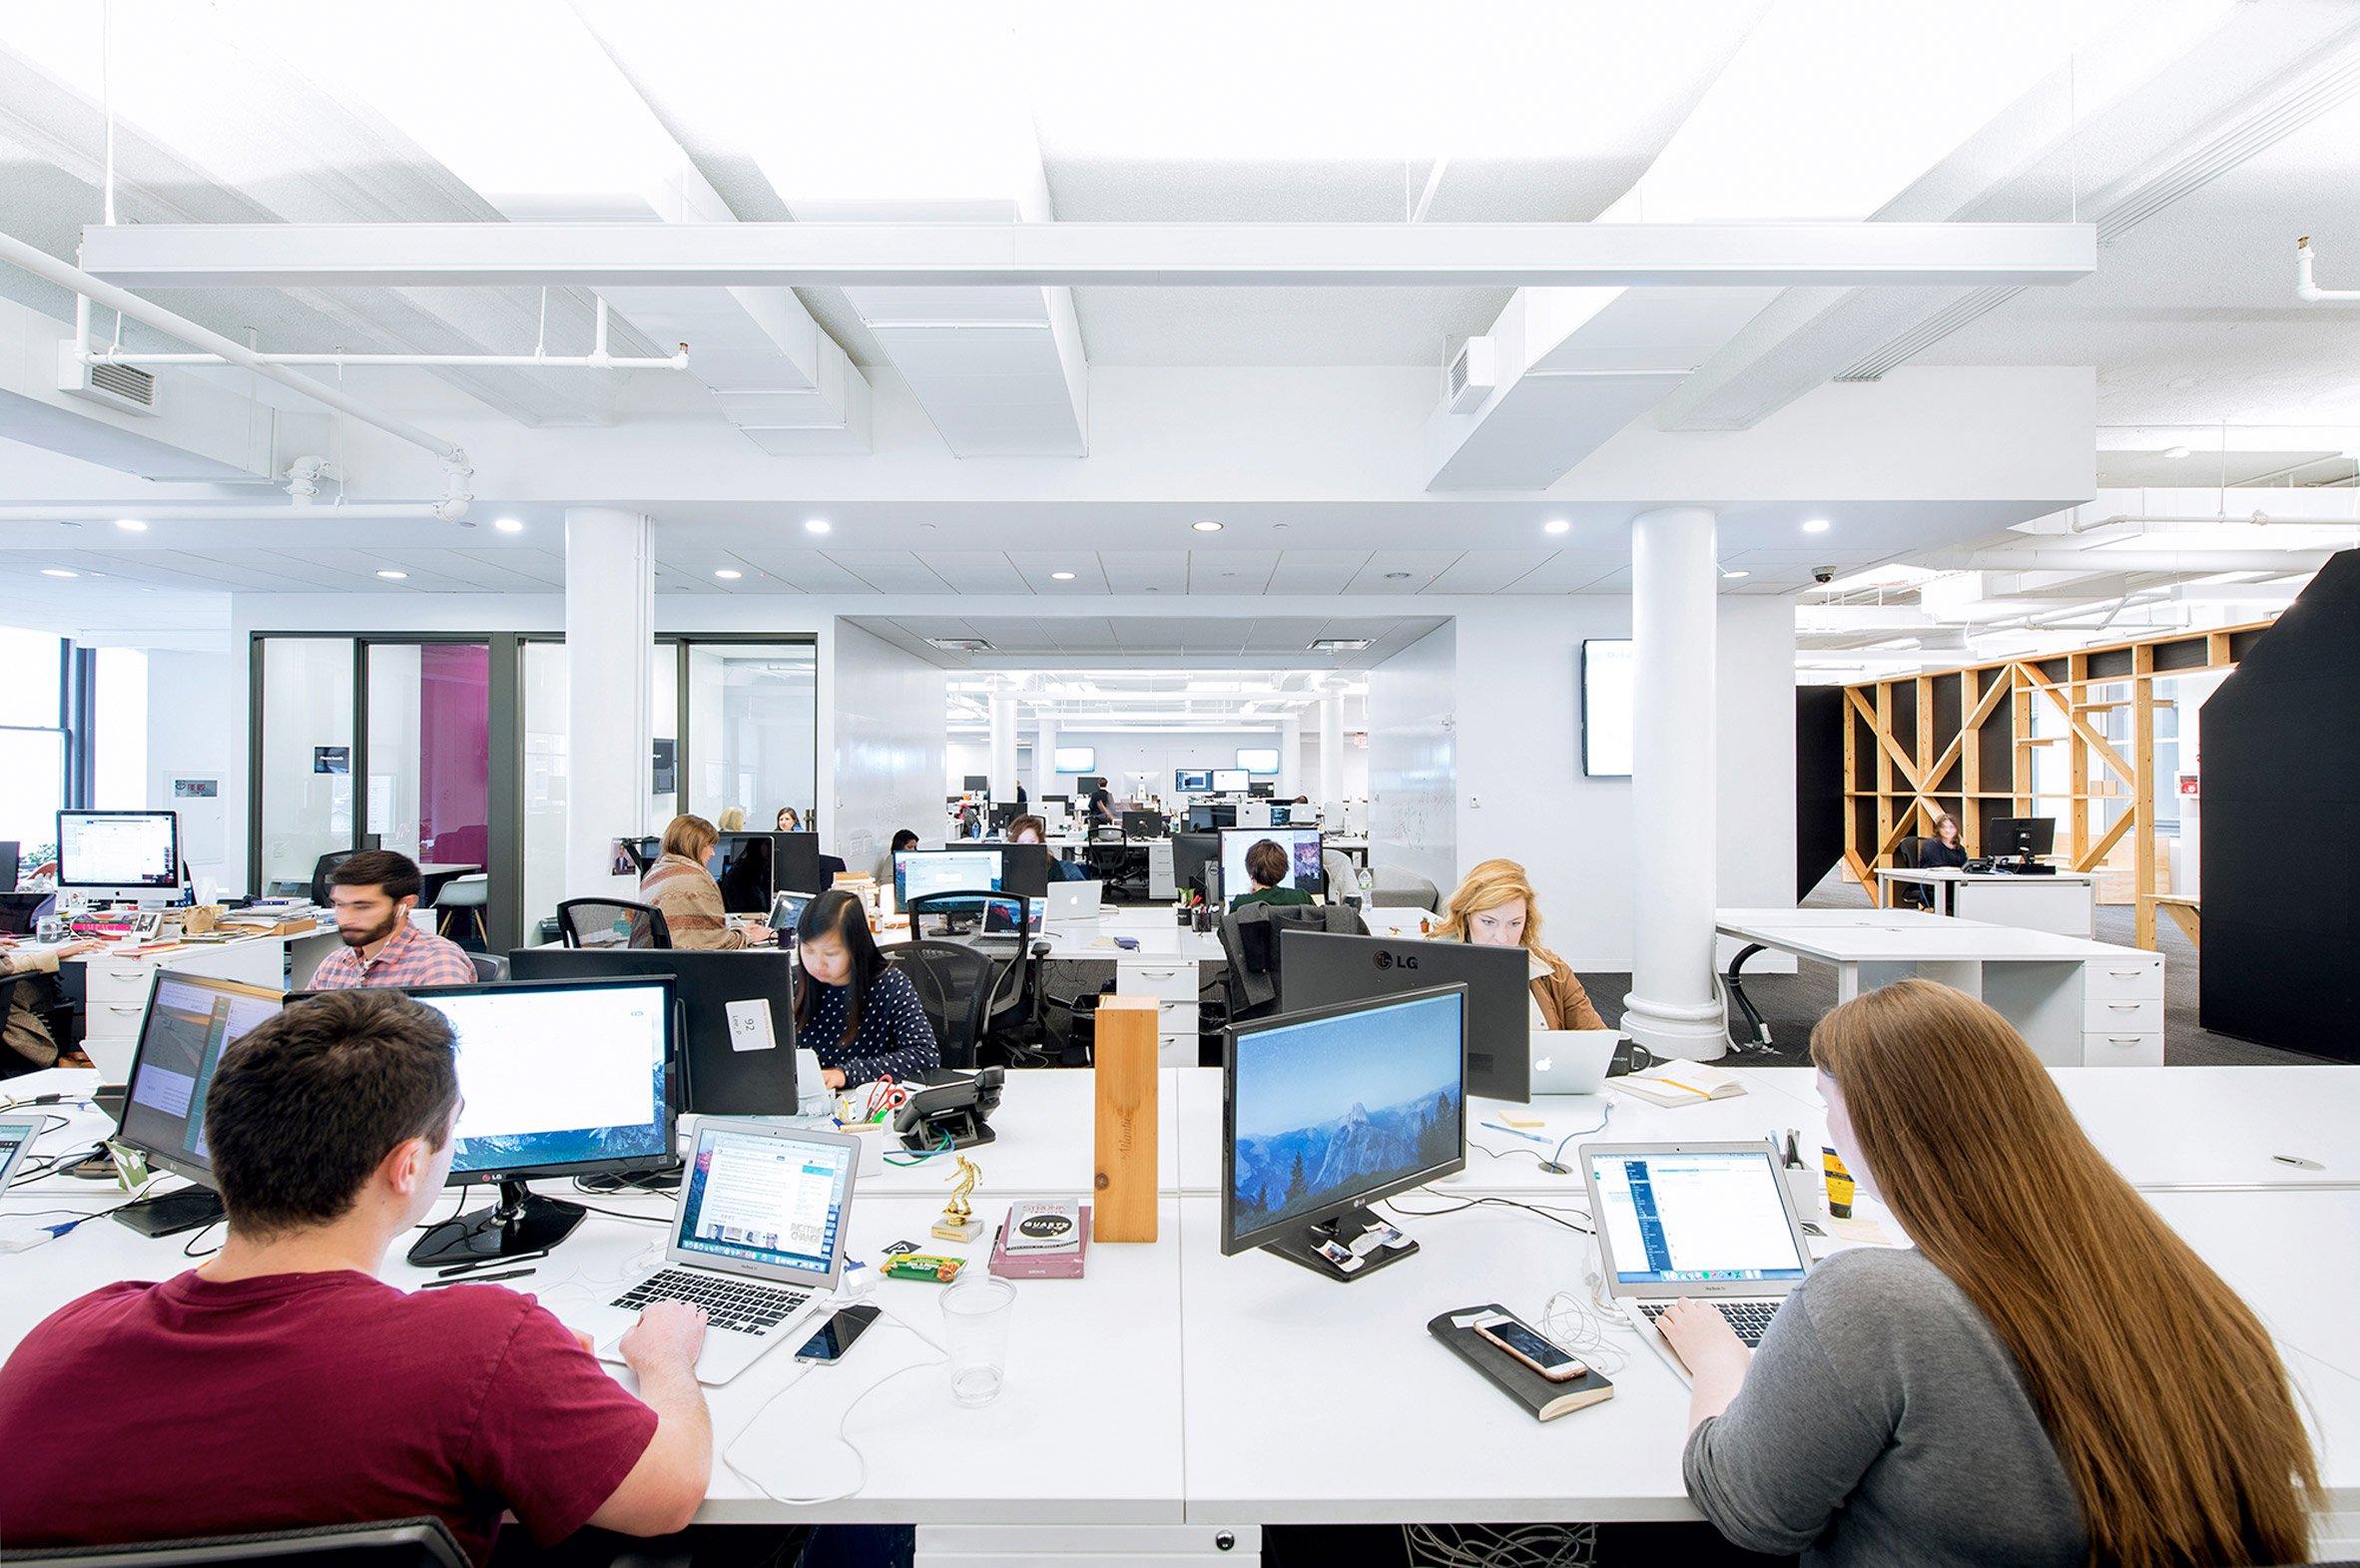 architecture-interiors-offices- manhatten-new-york-design-studia-osnovadesign-osnova-poltava_25